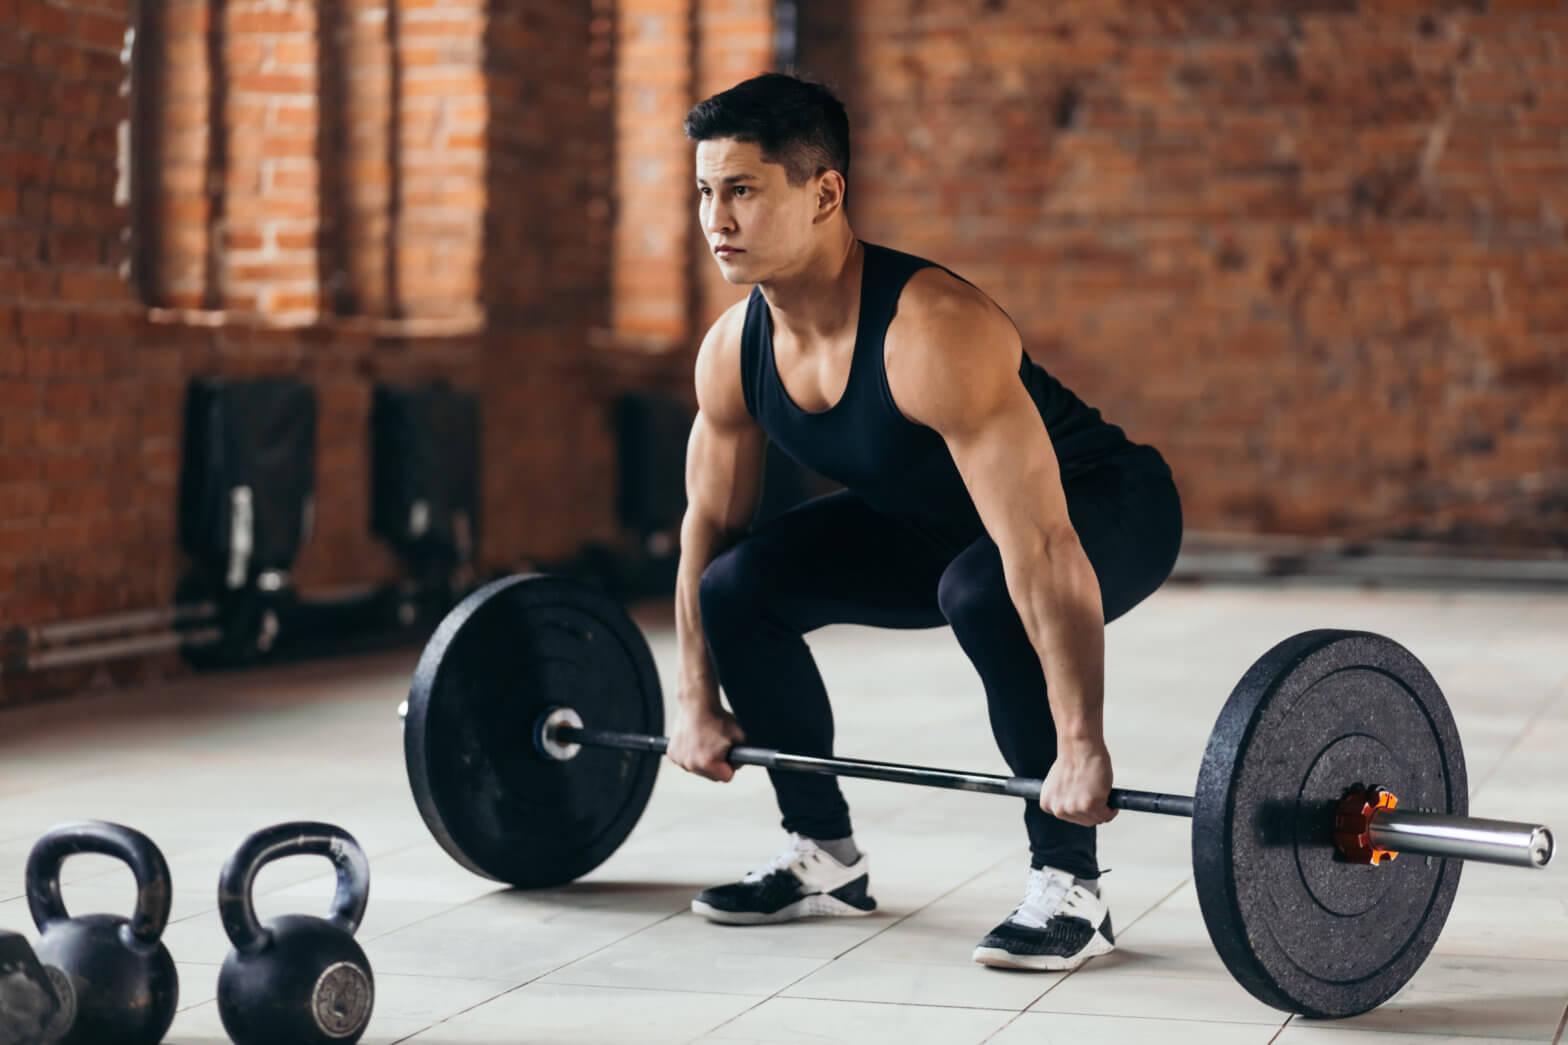 ergonomic training - evidence pt